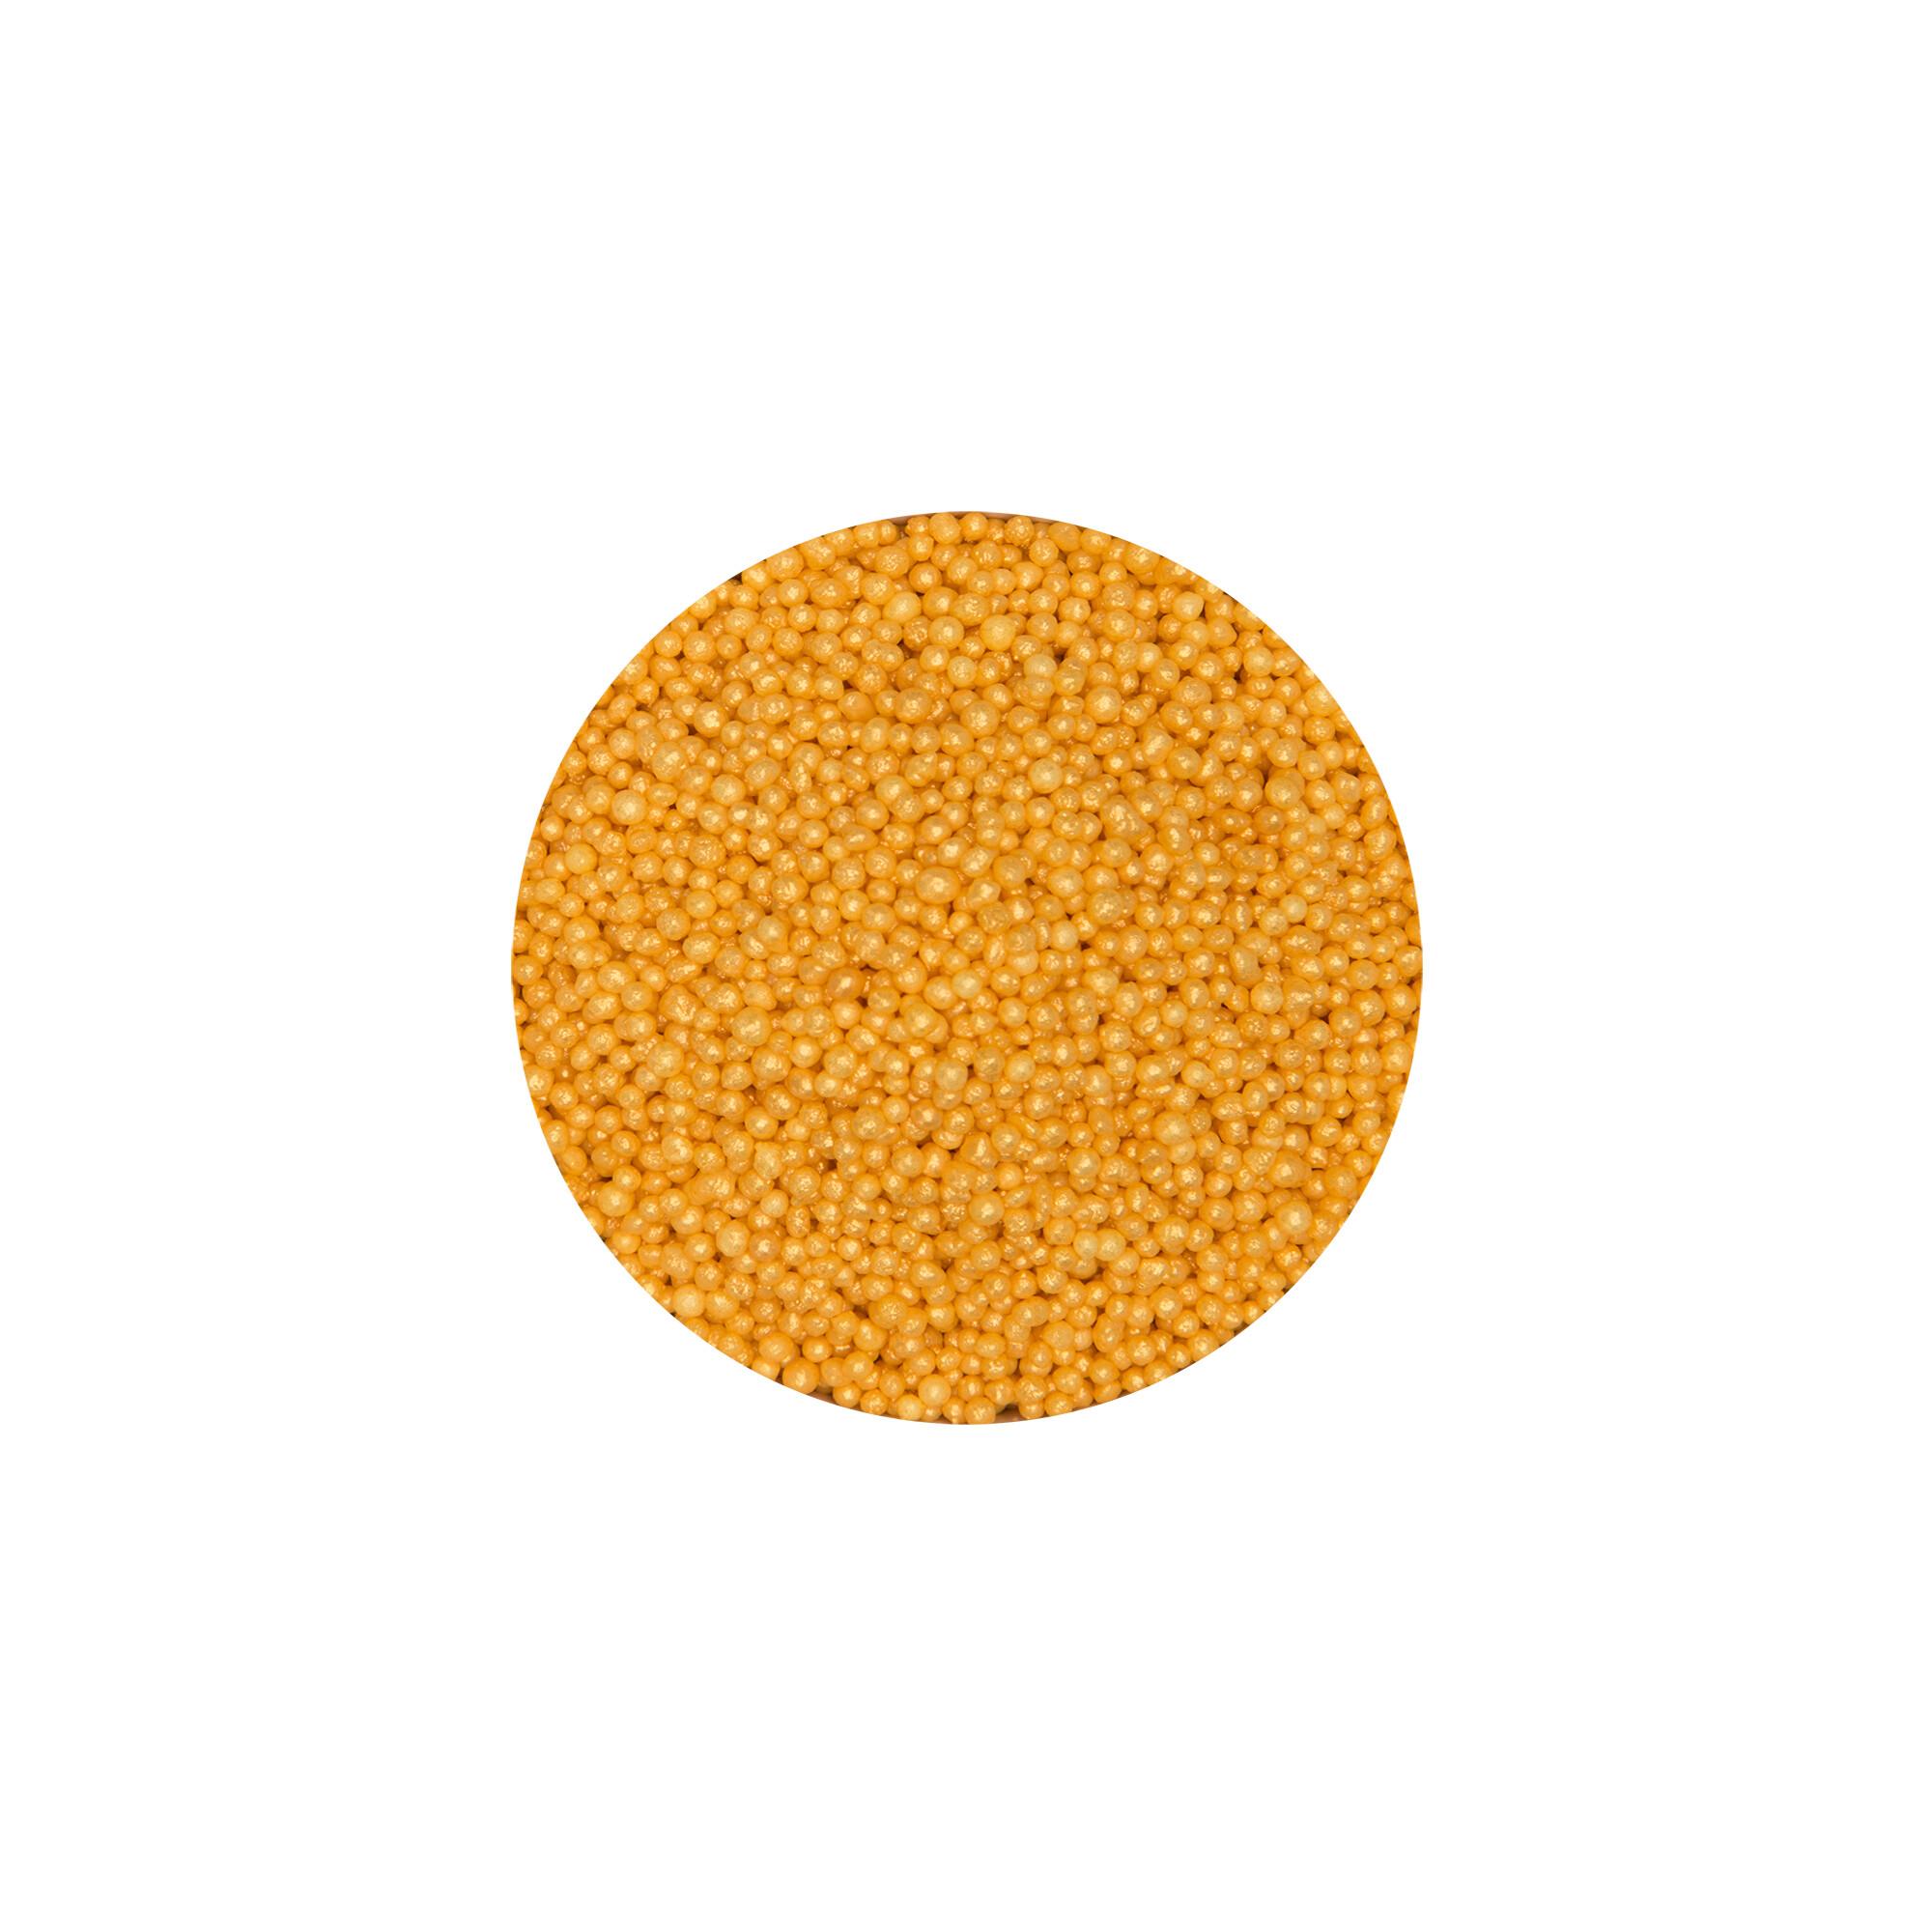 Edible sprinkle decoration - Nonpareils